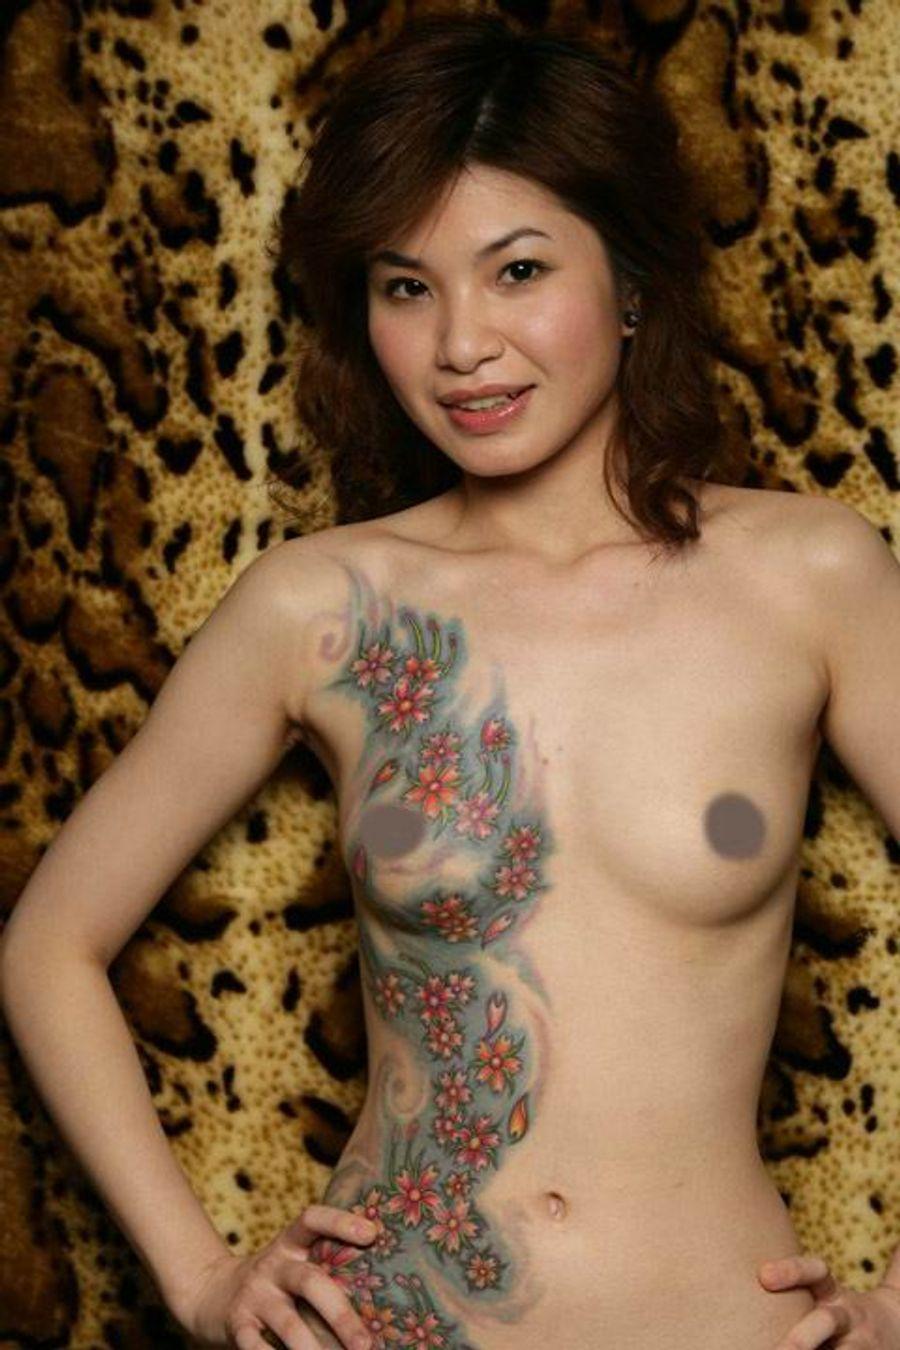 XLLinky's sex videos & porn photo galleries.